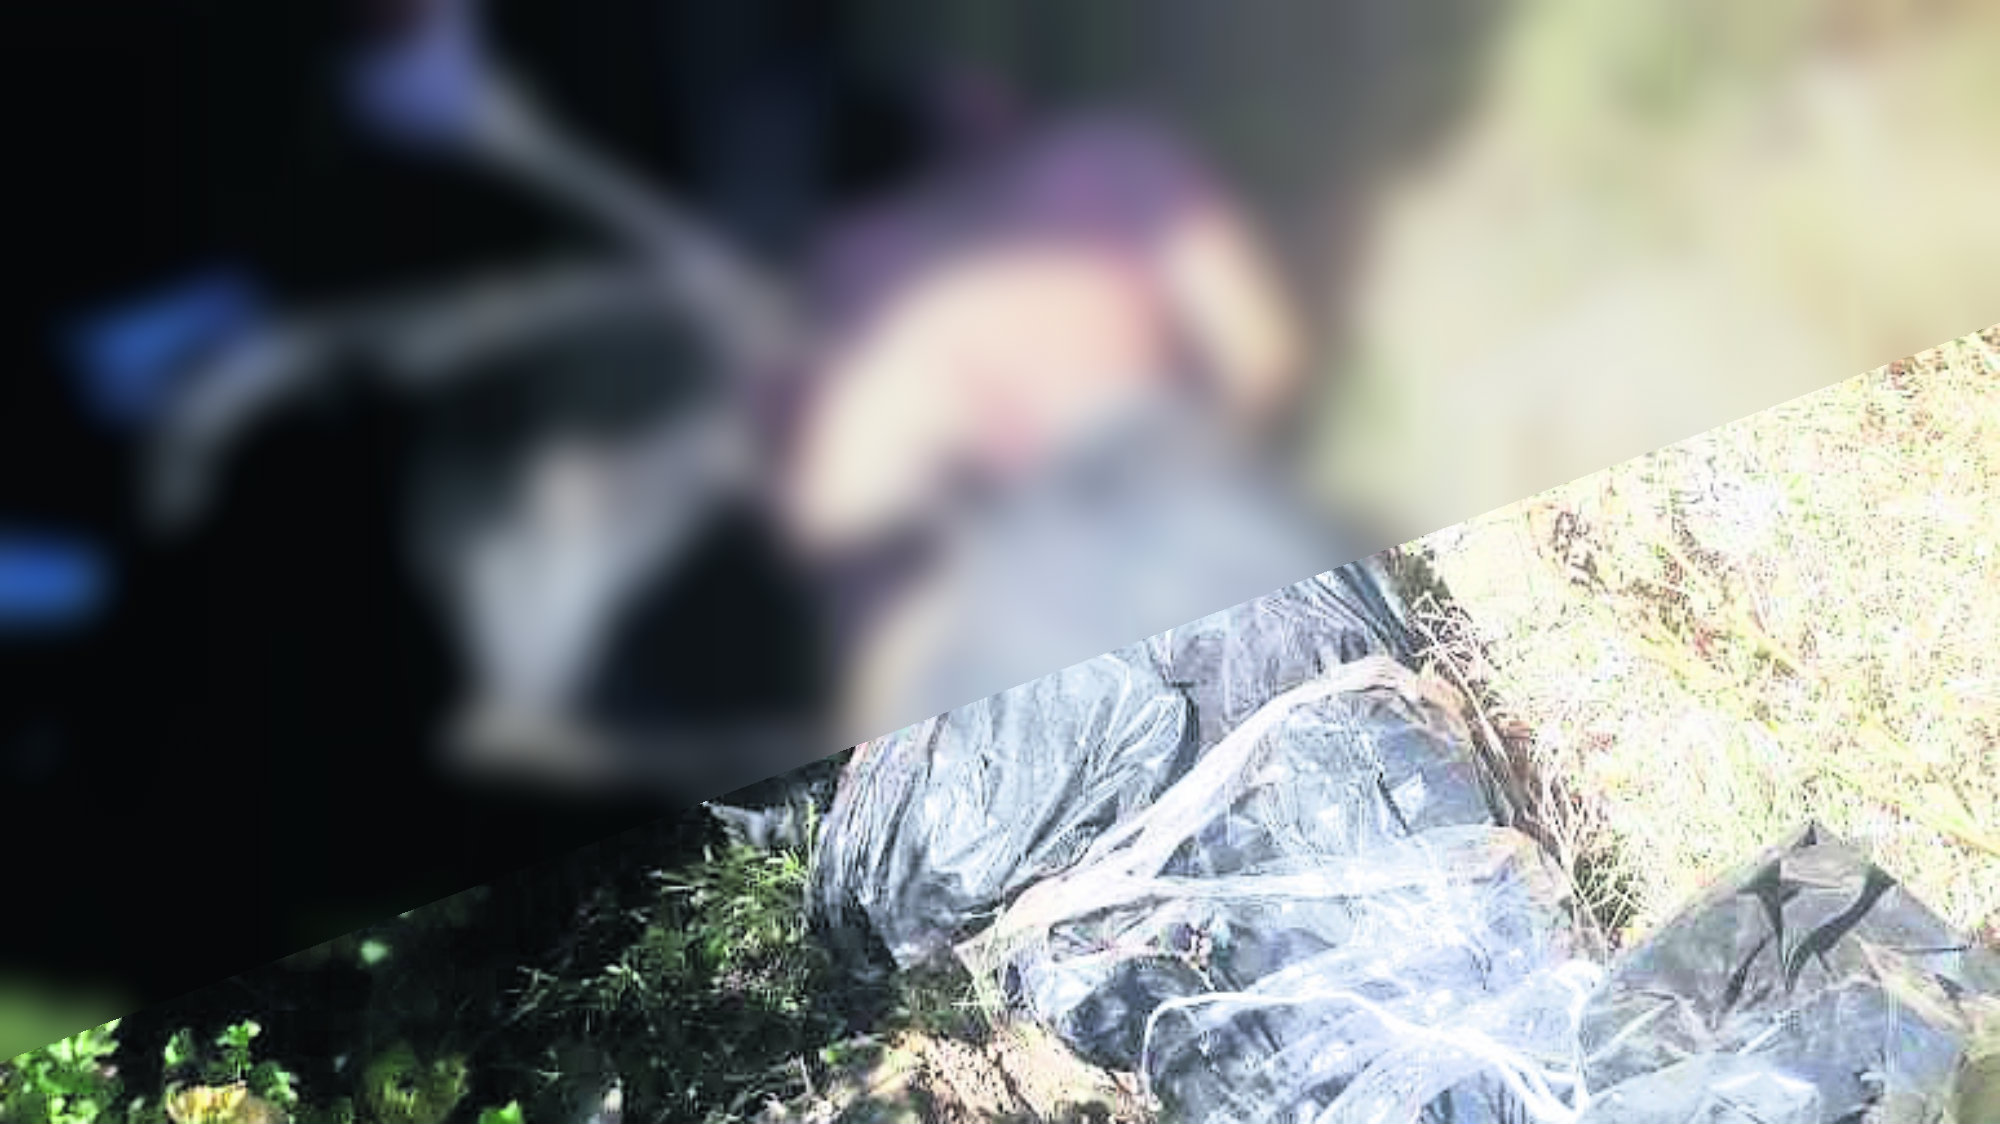 Cadáver Maniatado La Paz Edoméx